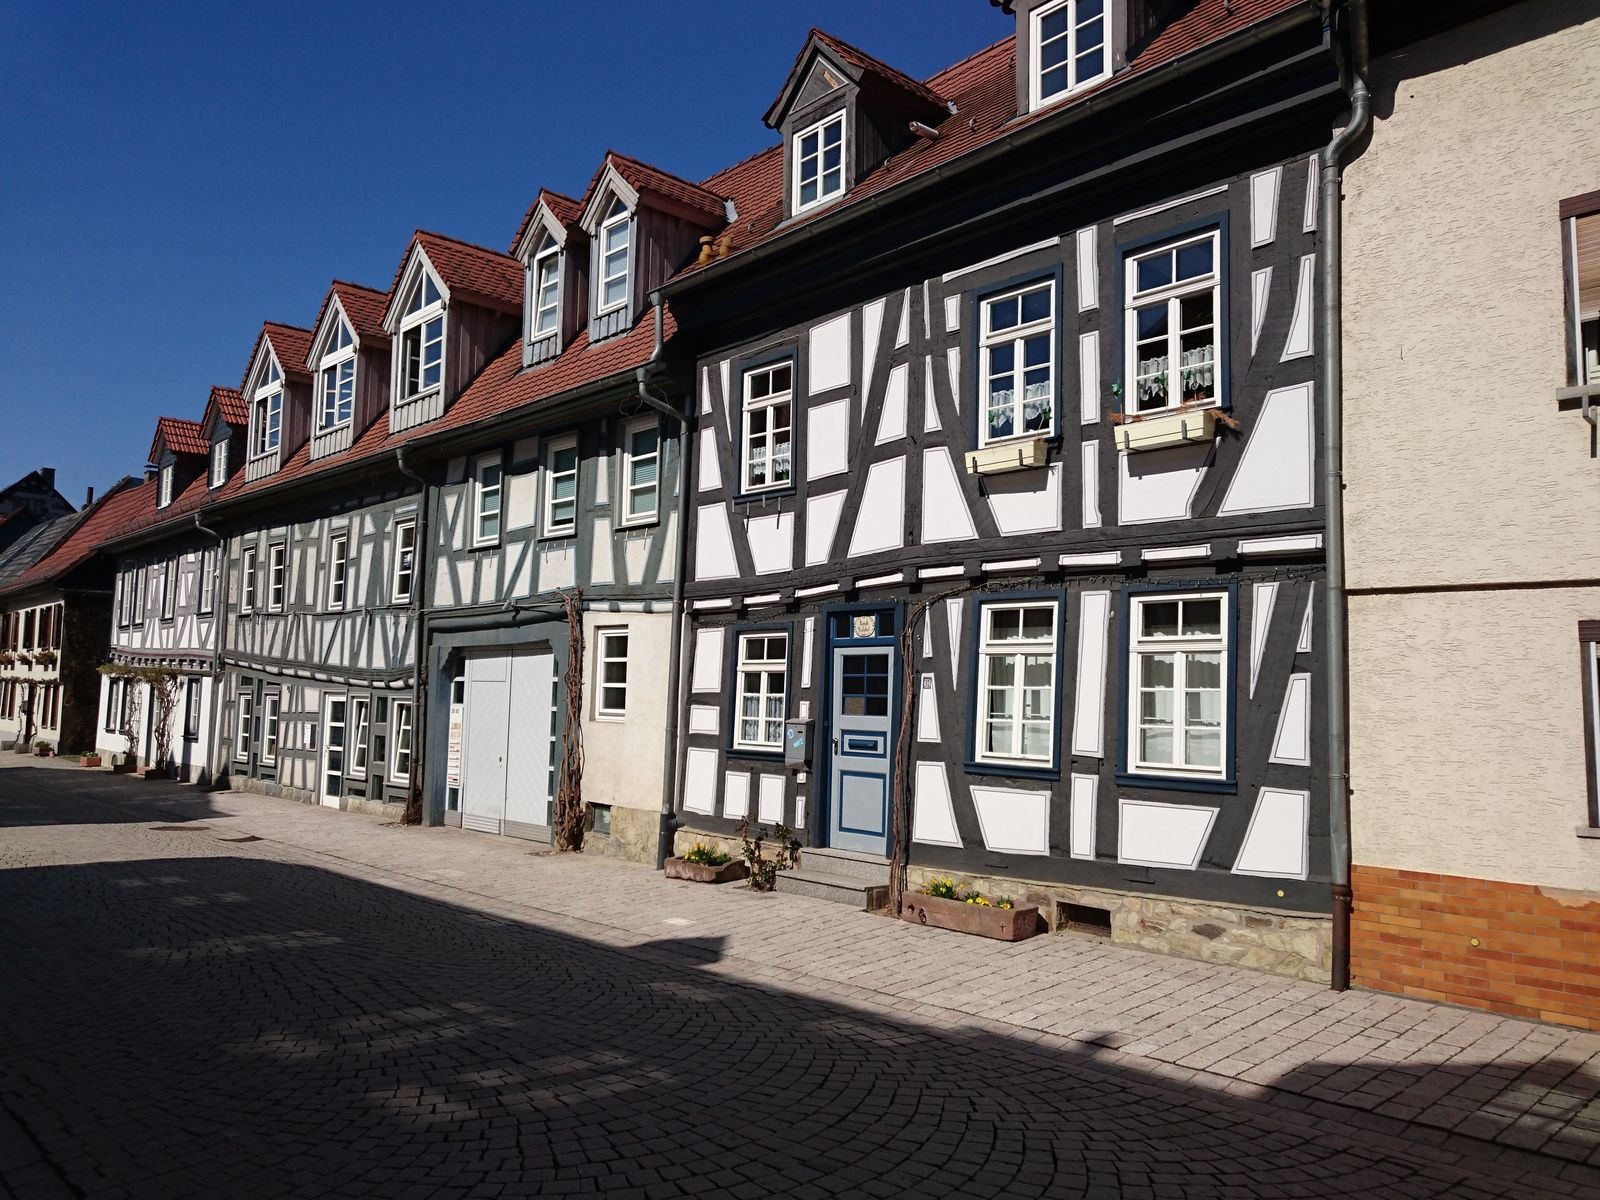 Idstein Streets